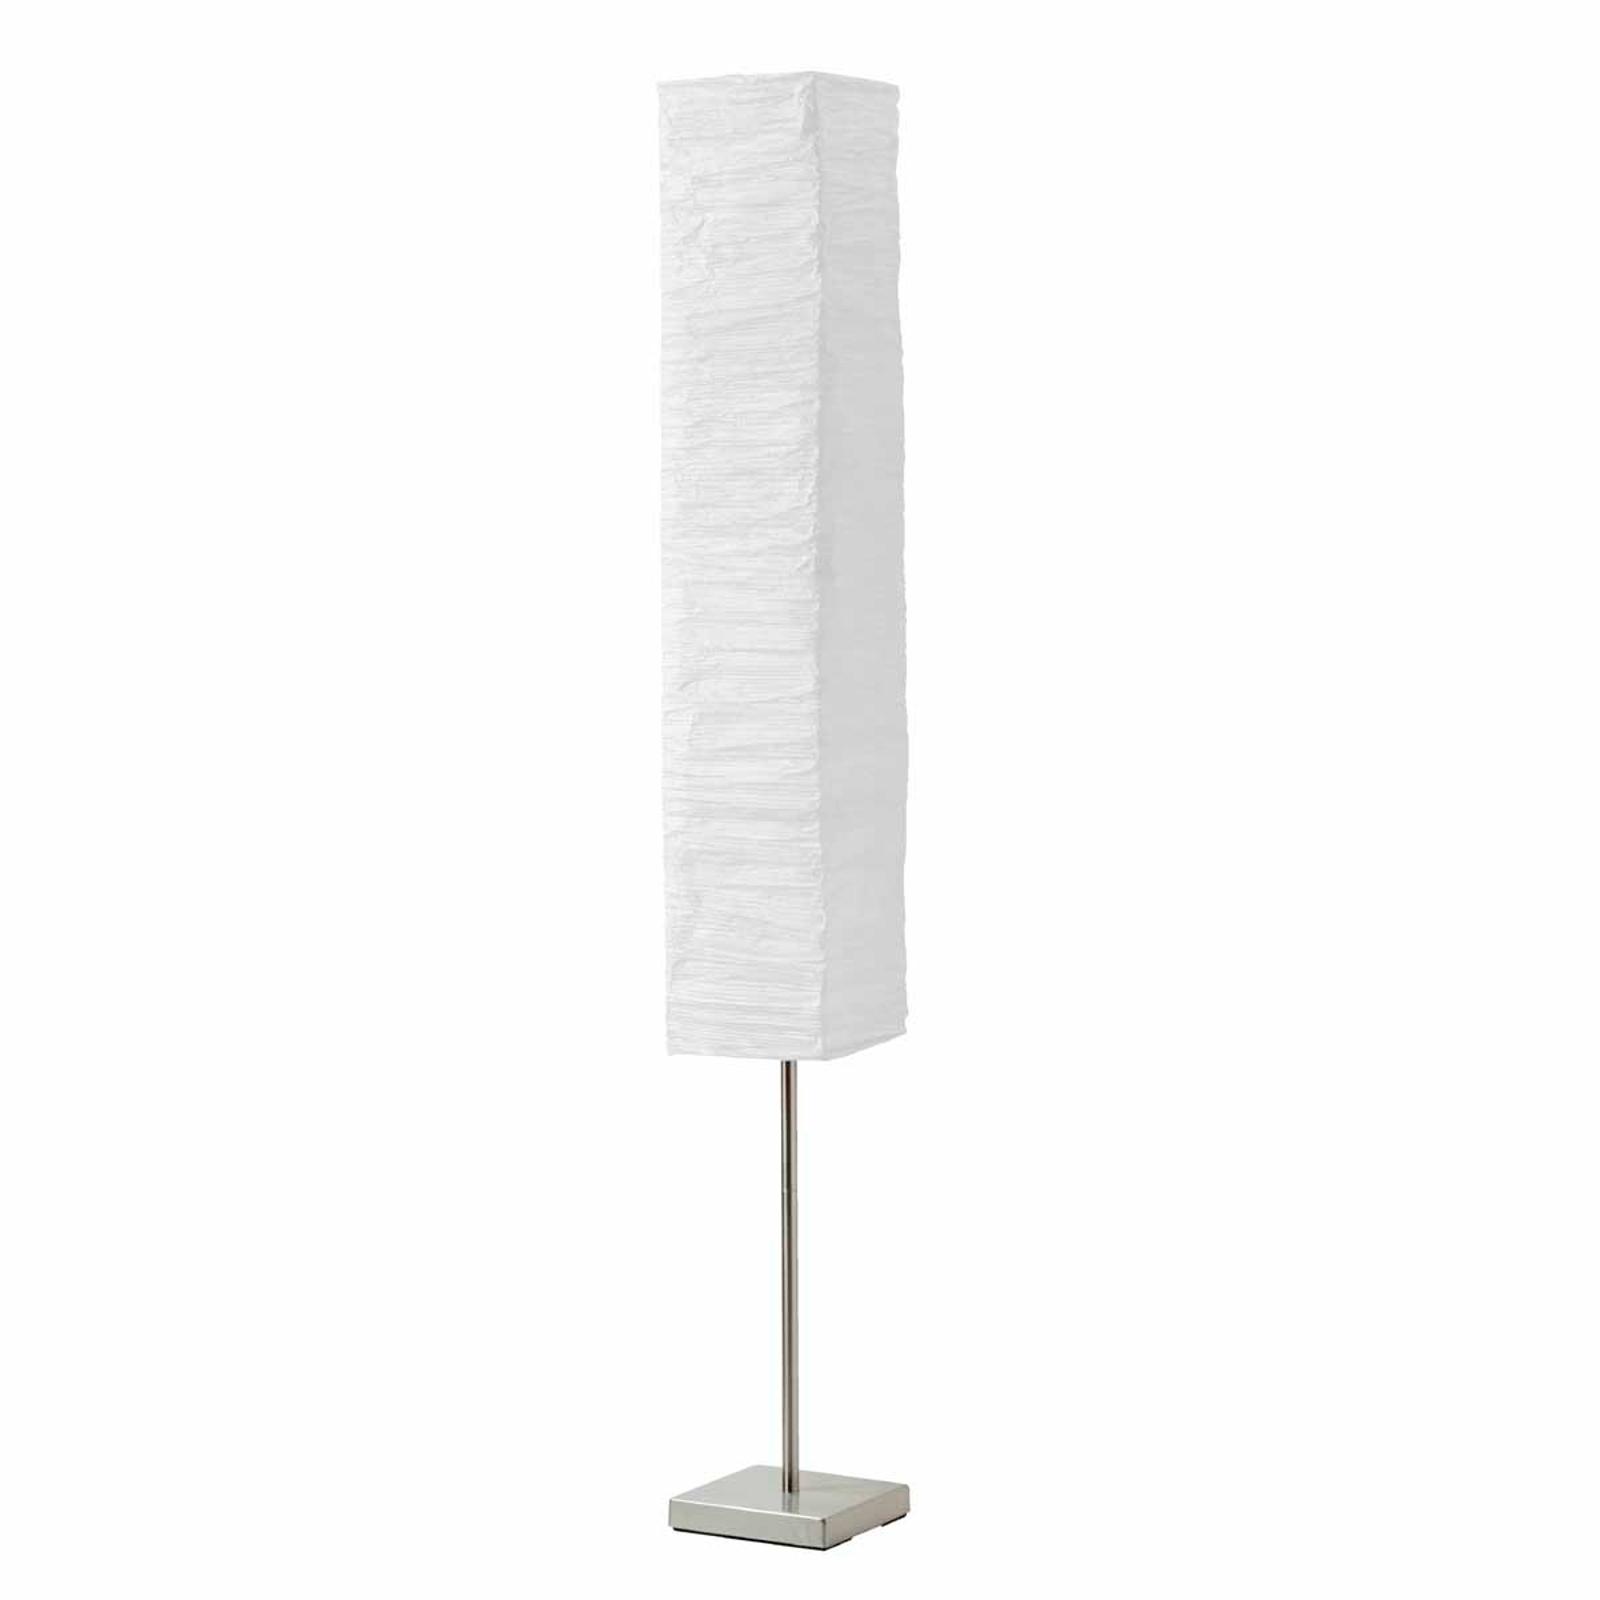 Allsidig Nerva gulvlampe i hvitt